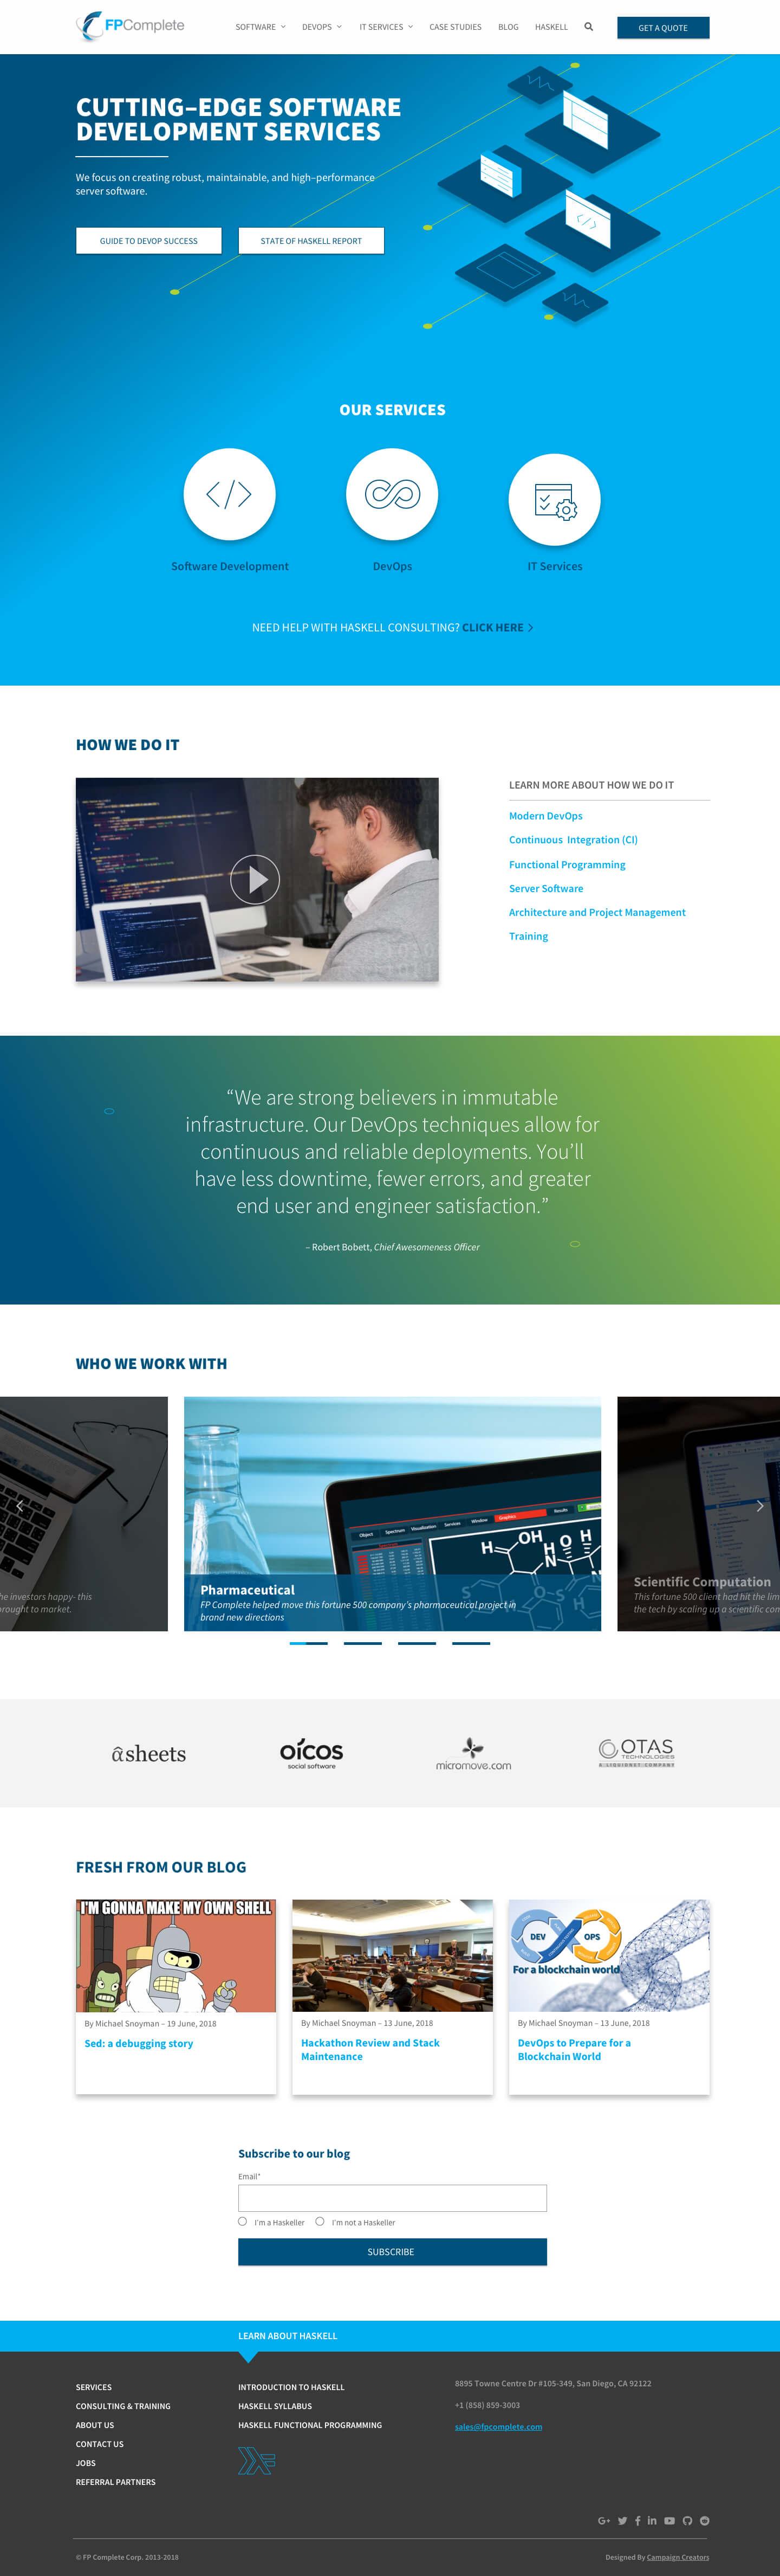 FPComplete-Homepage